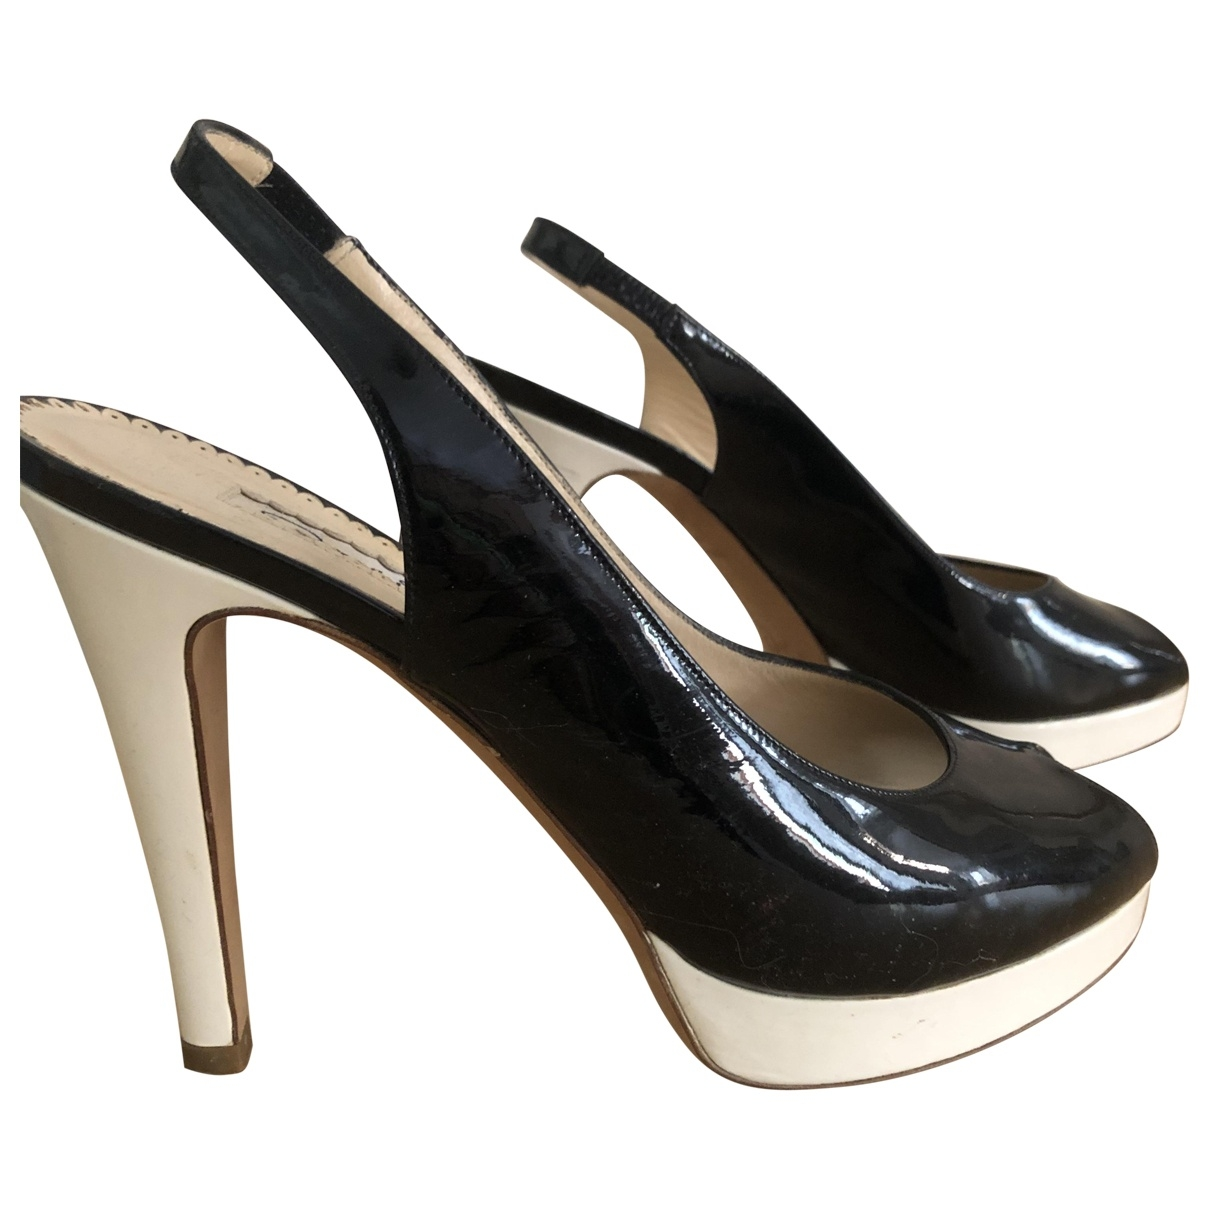 Oscar De La Renta \N Black Patent leather Heels for Women 38 EU